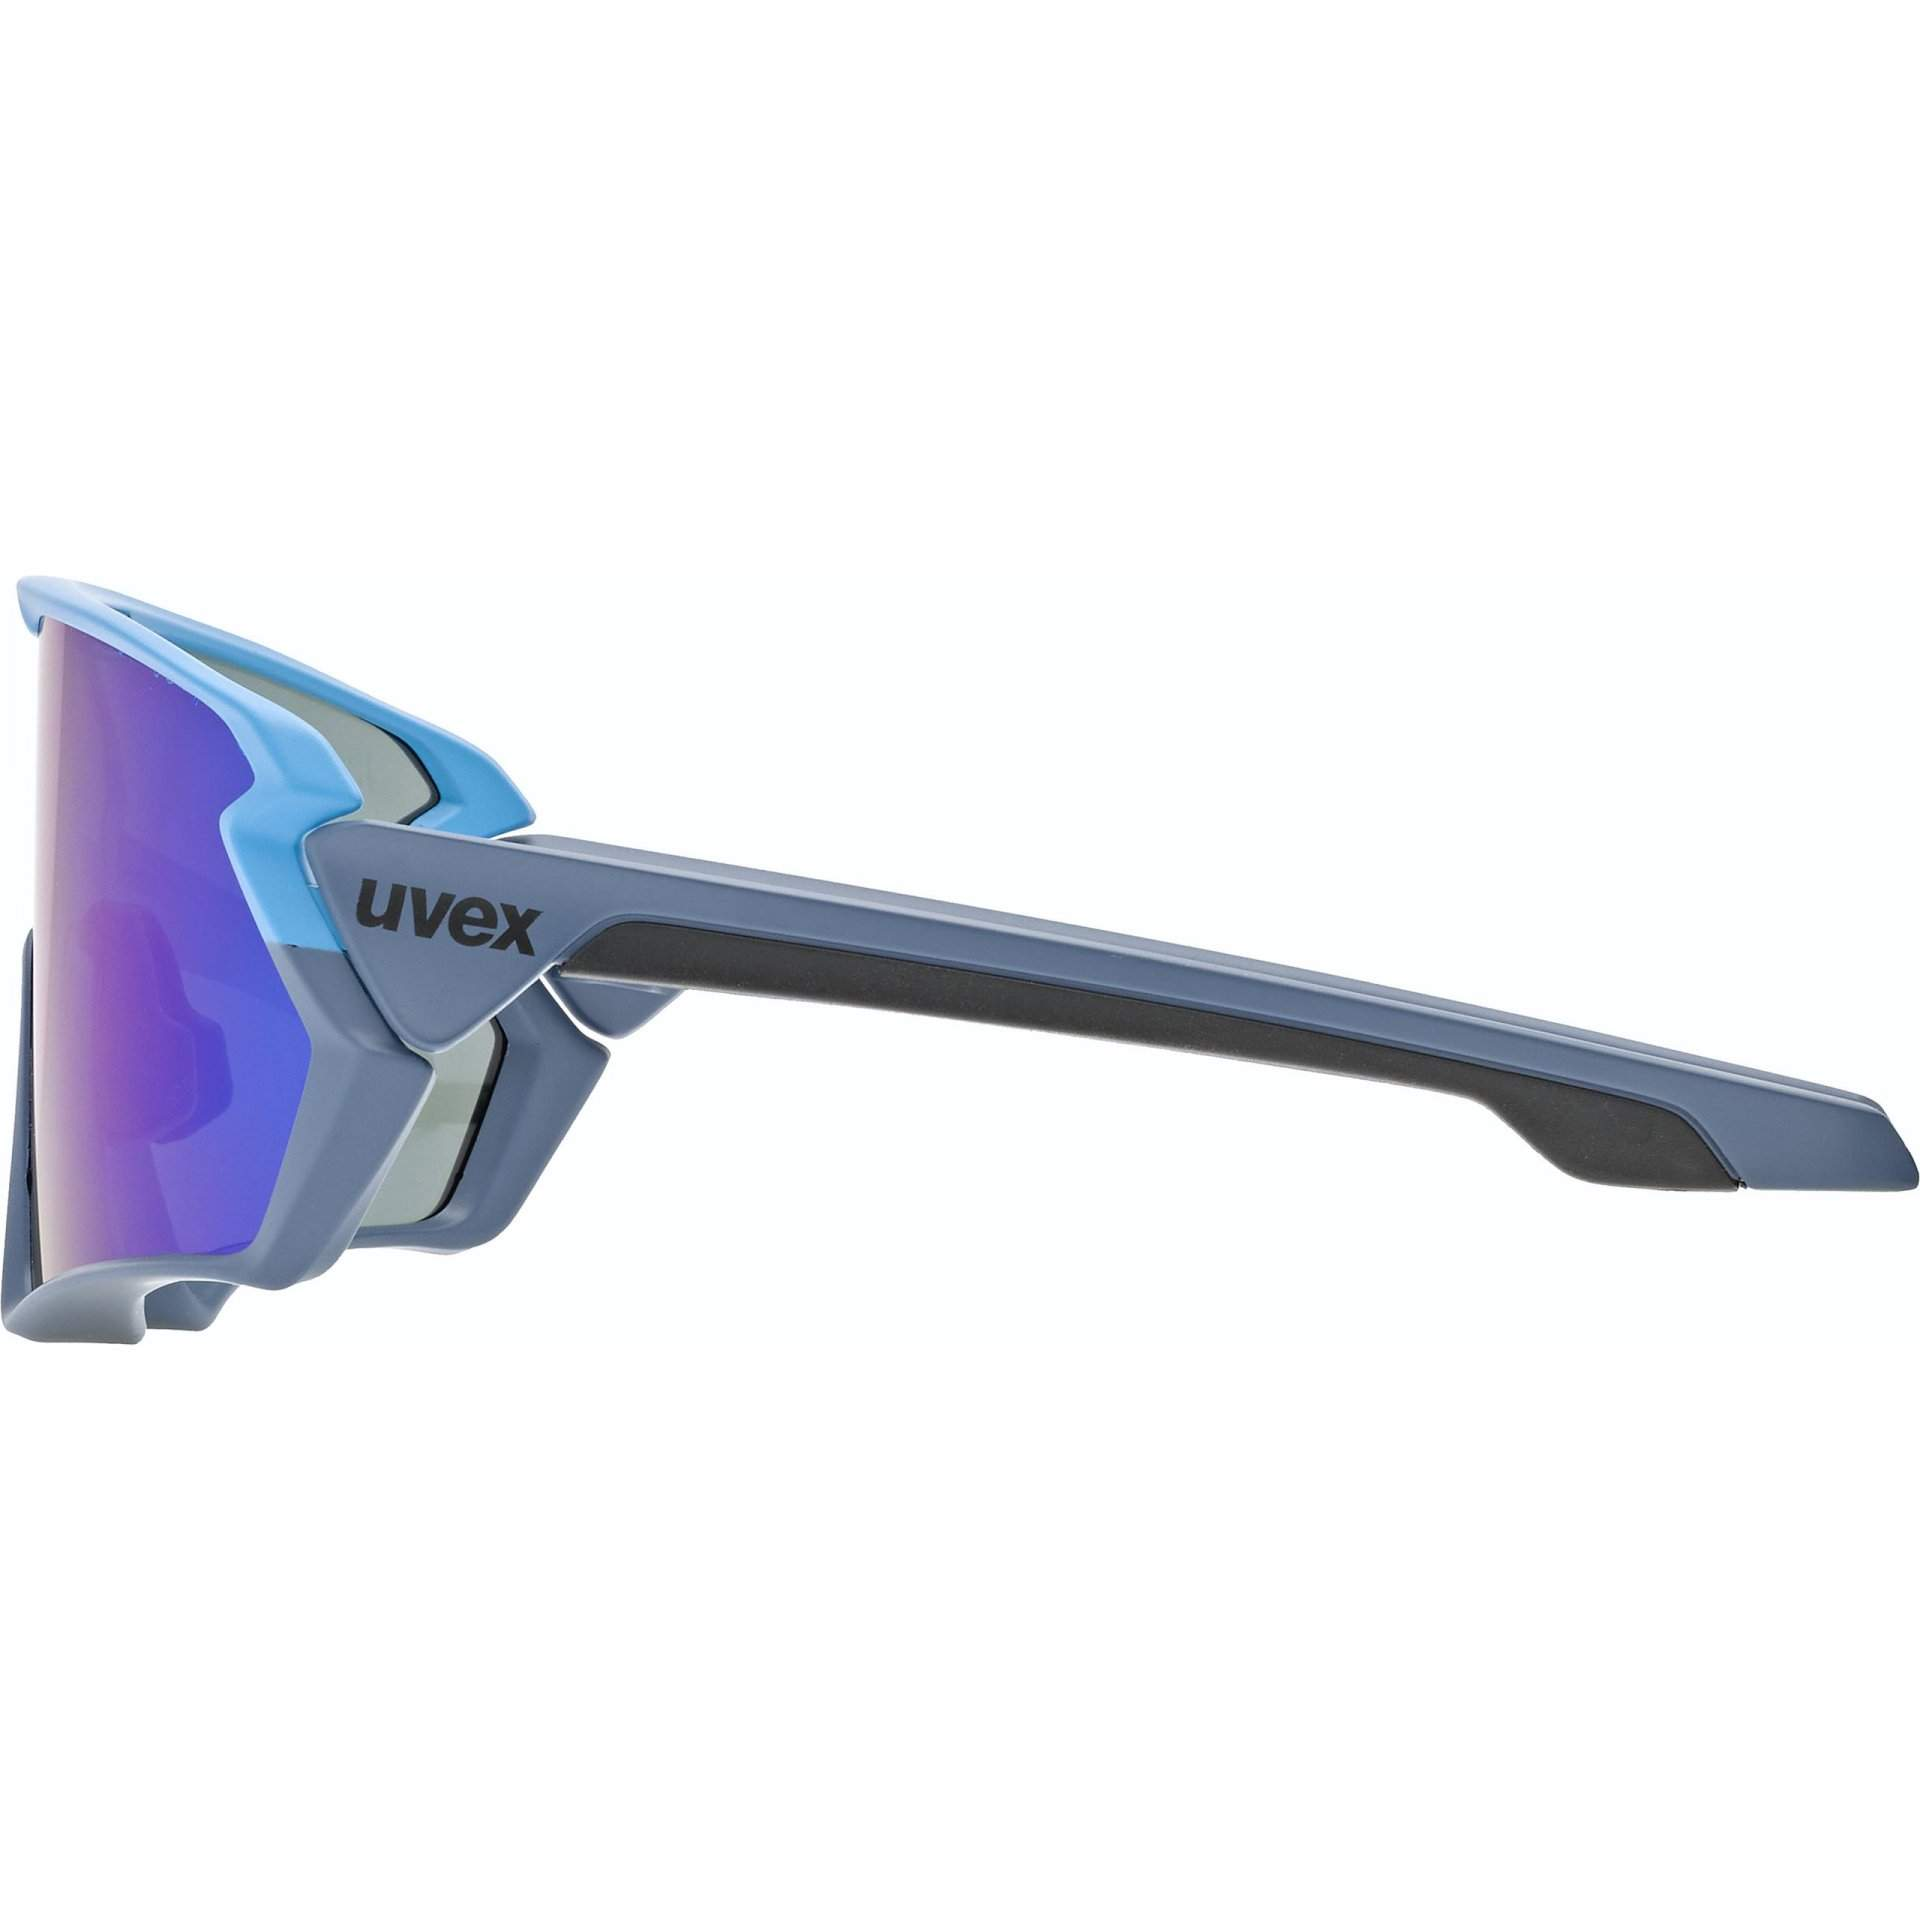 OKULARY UVEX SPORTSTYLE 231 53|2|065|4516 BLUE GREY MAT Z BOKU